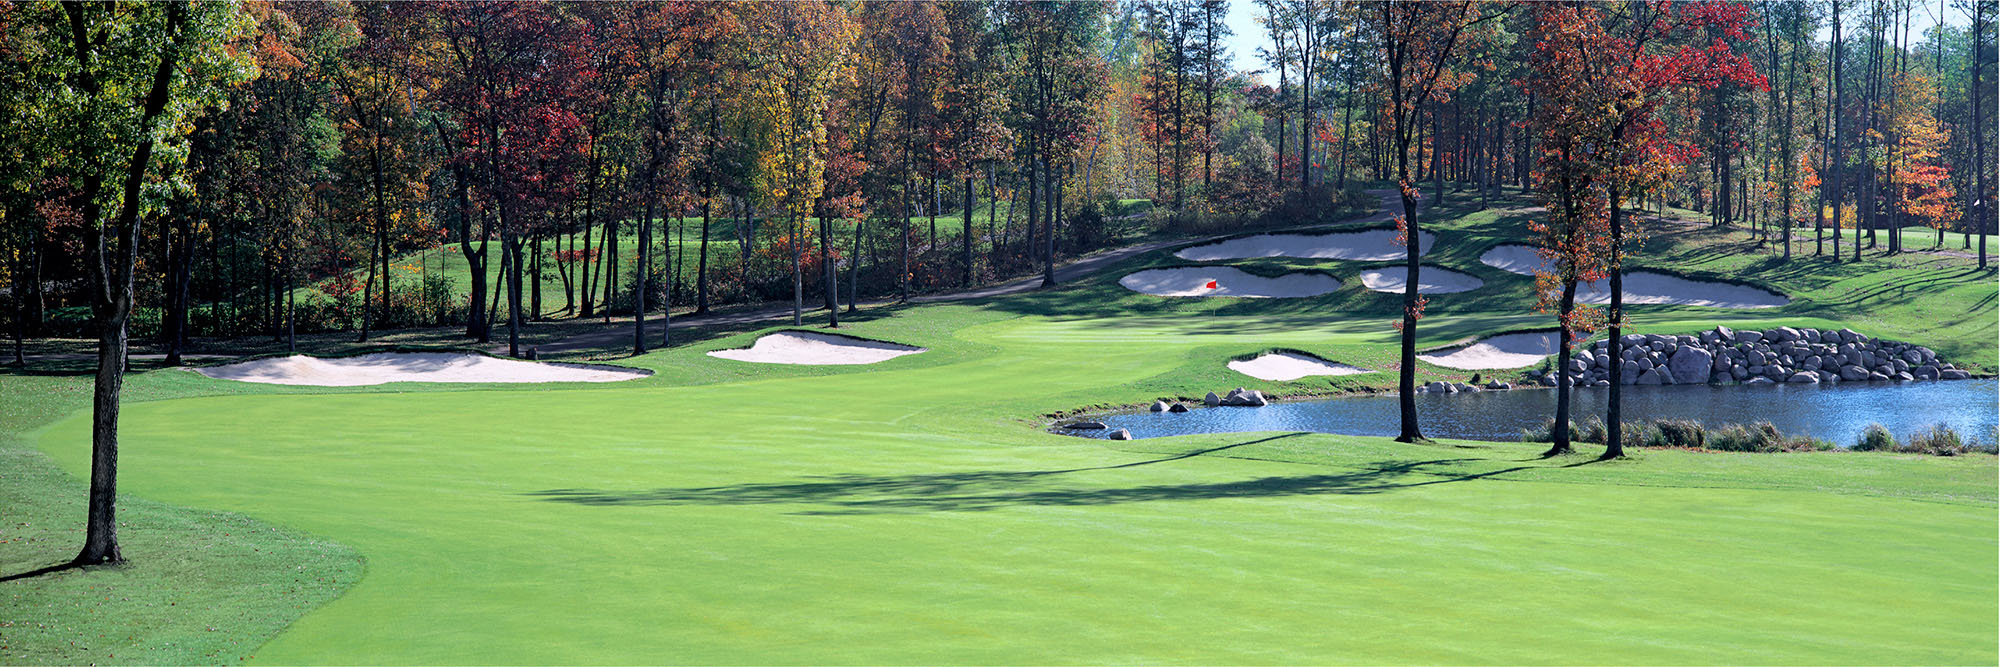 Golf Course Image - Maddens Classic No. 11